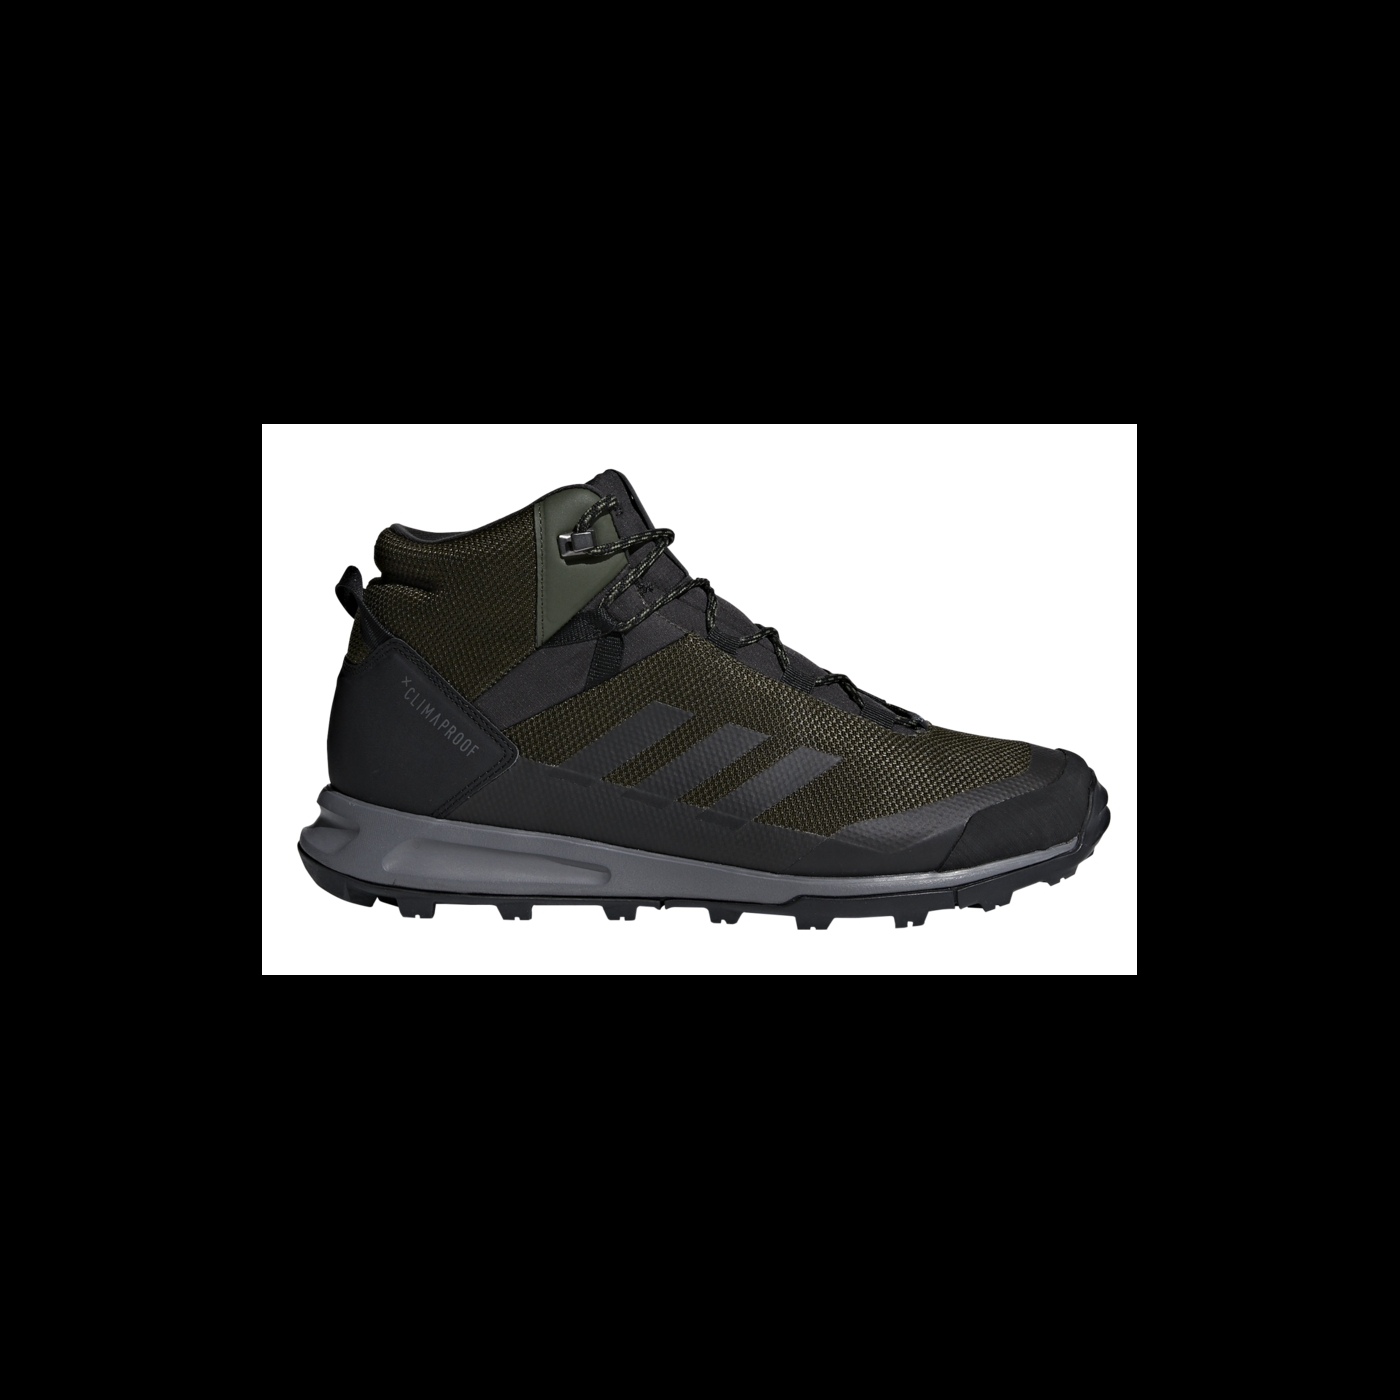 a50b252c6 Chaussures Randonnée Adidas Terrex Tivid Mid Cp Cargo | Alltricks.com